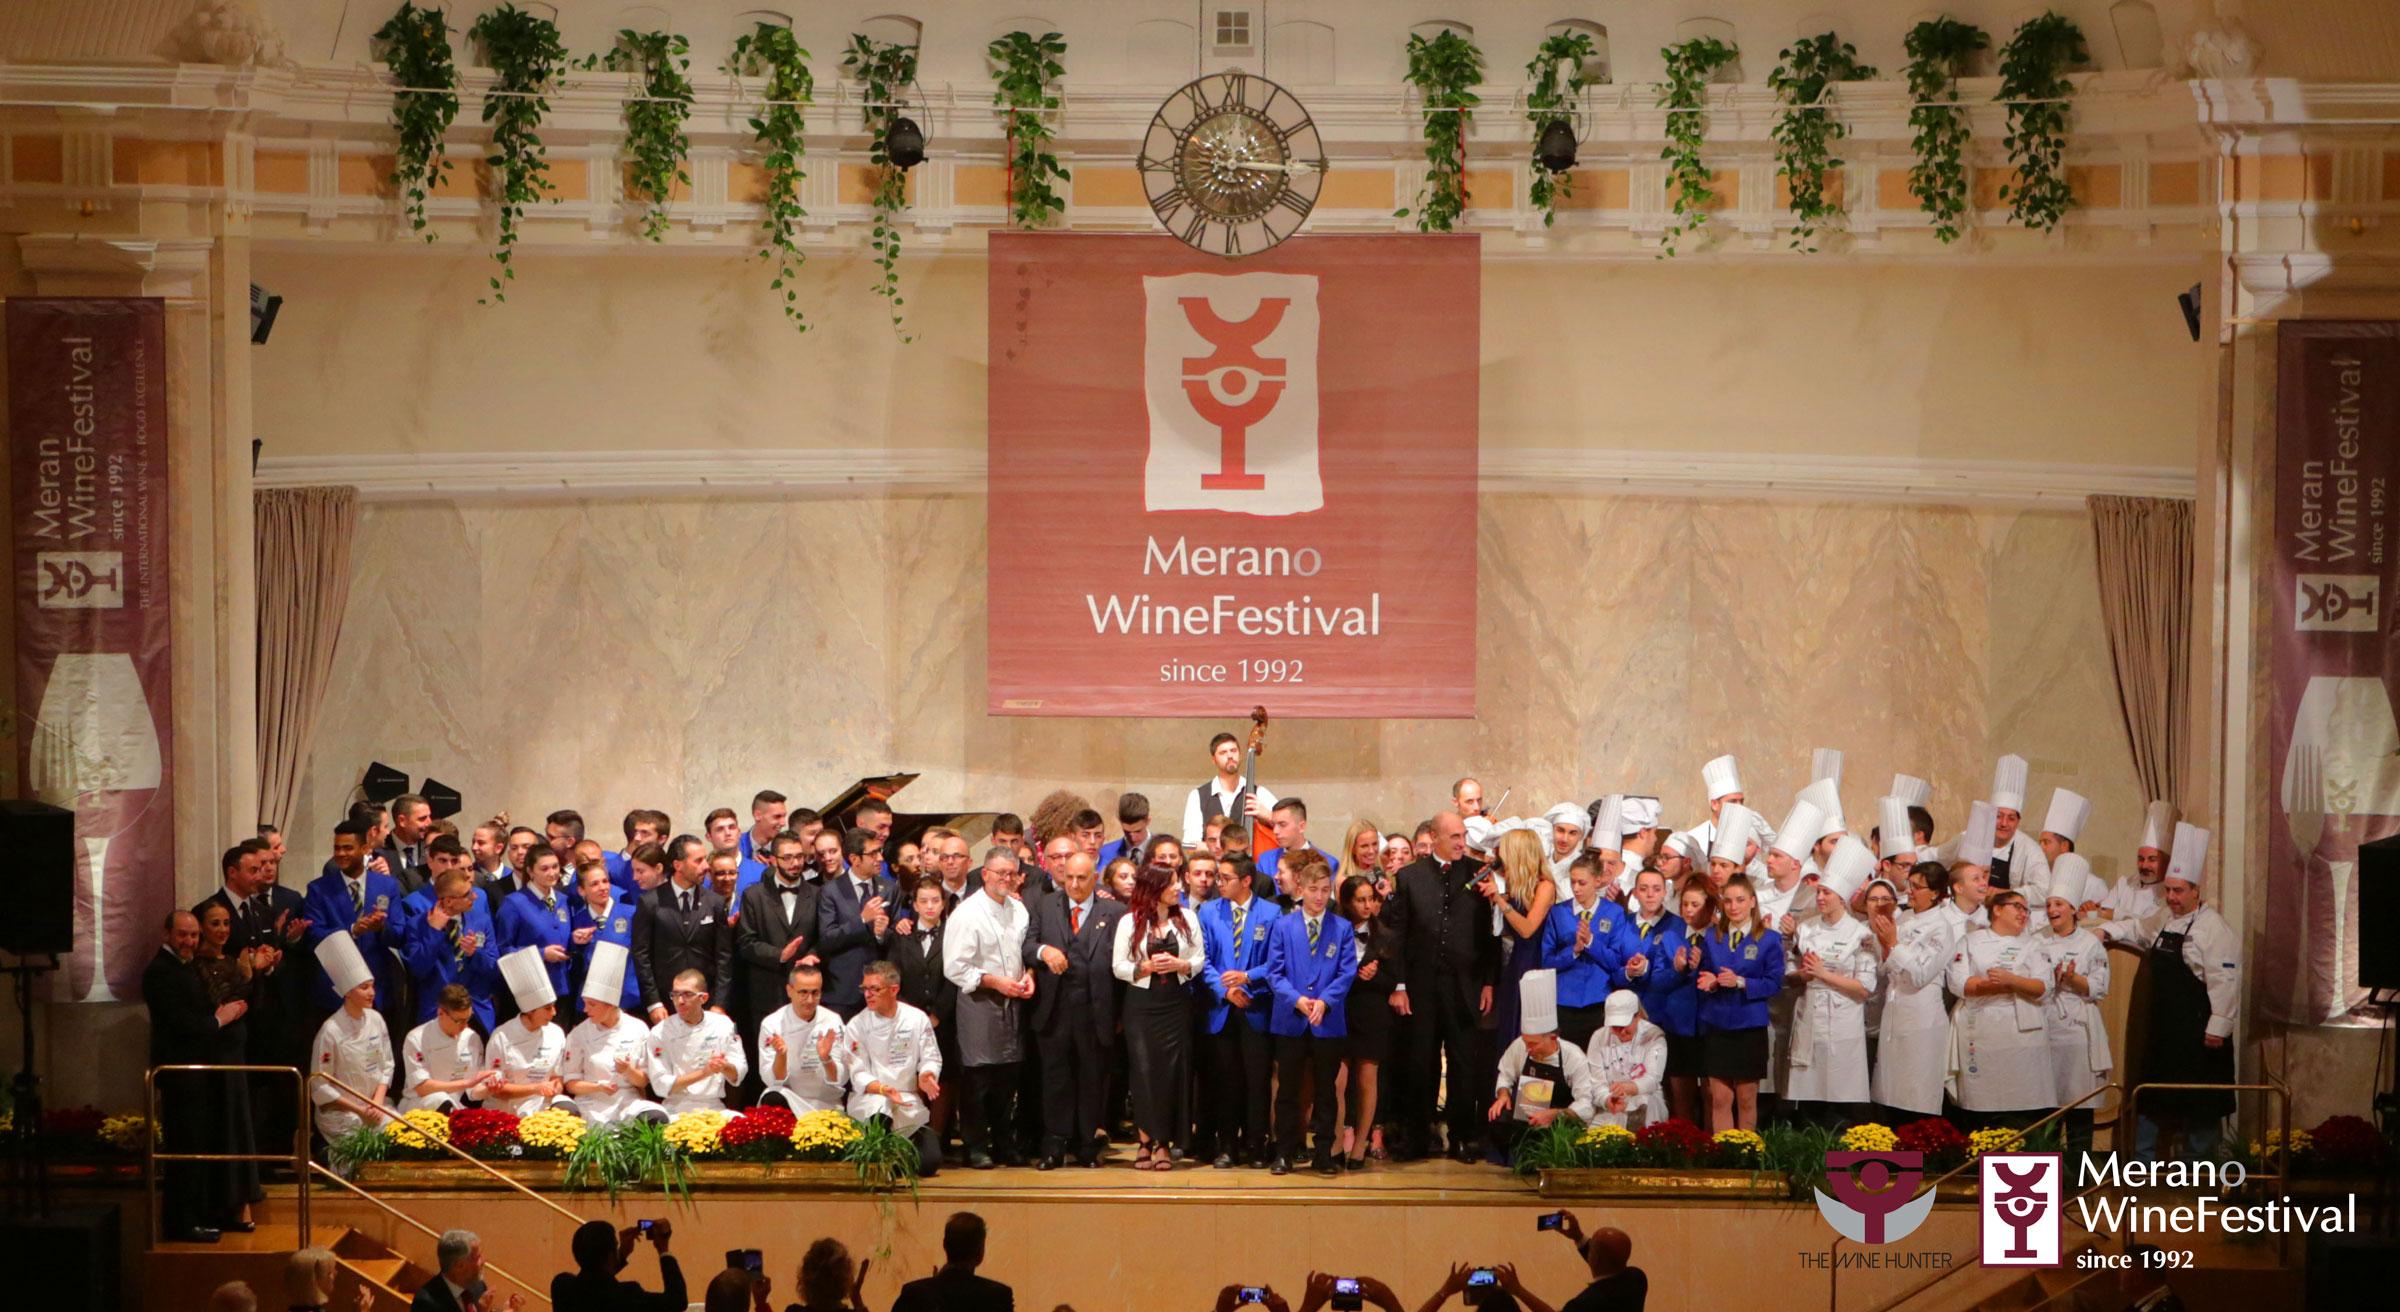 Throwback on Merano Wine Festival 2018